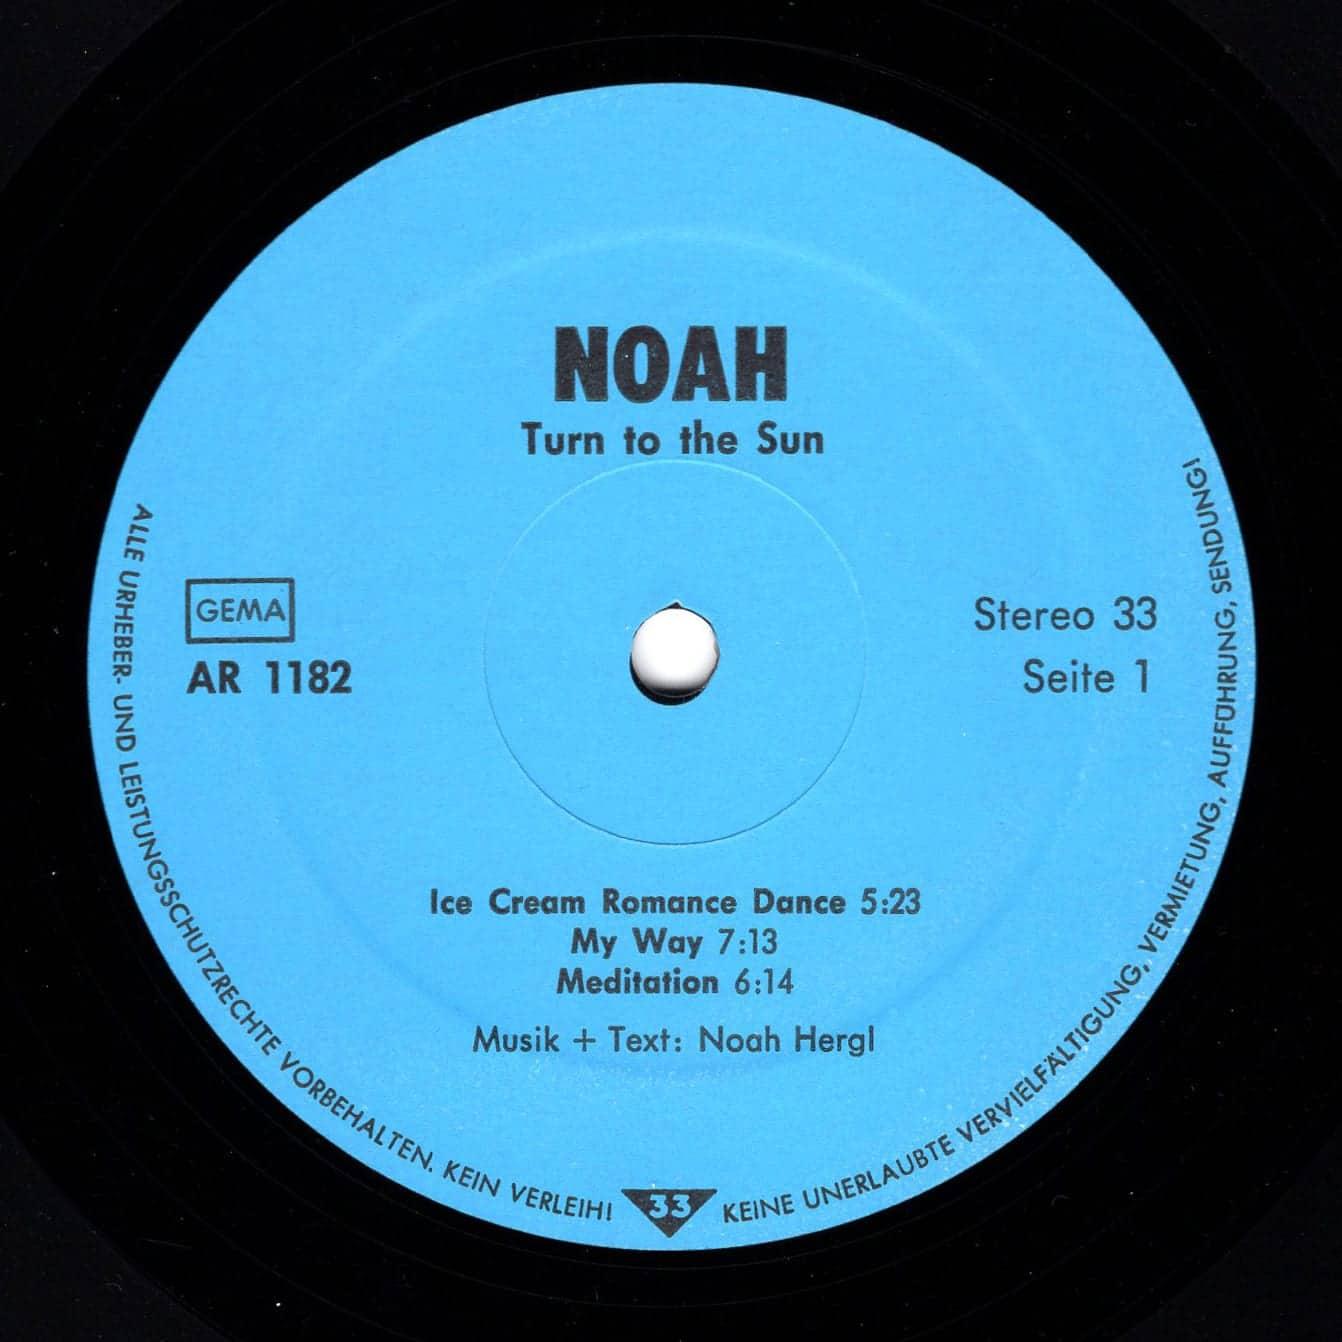 NOAH - Turn to the Sun –  AR 1182 Germany 1982